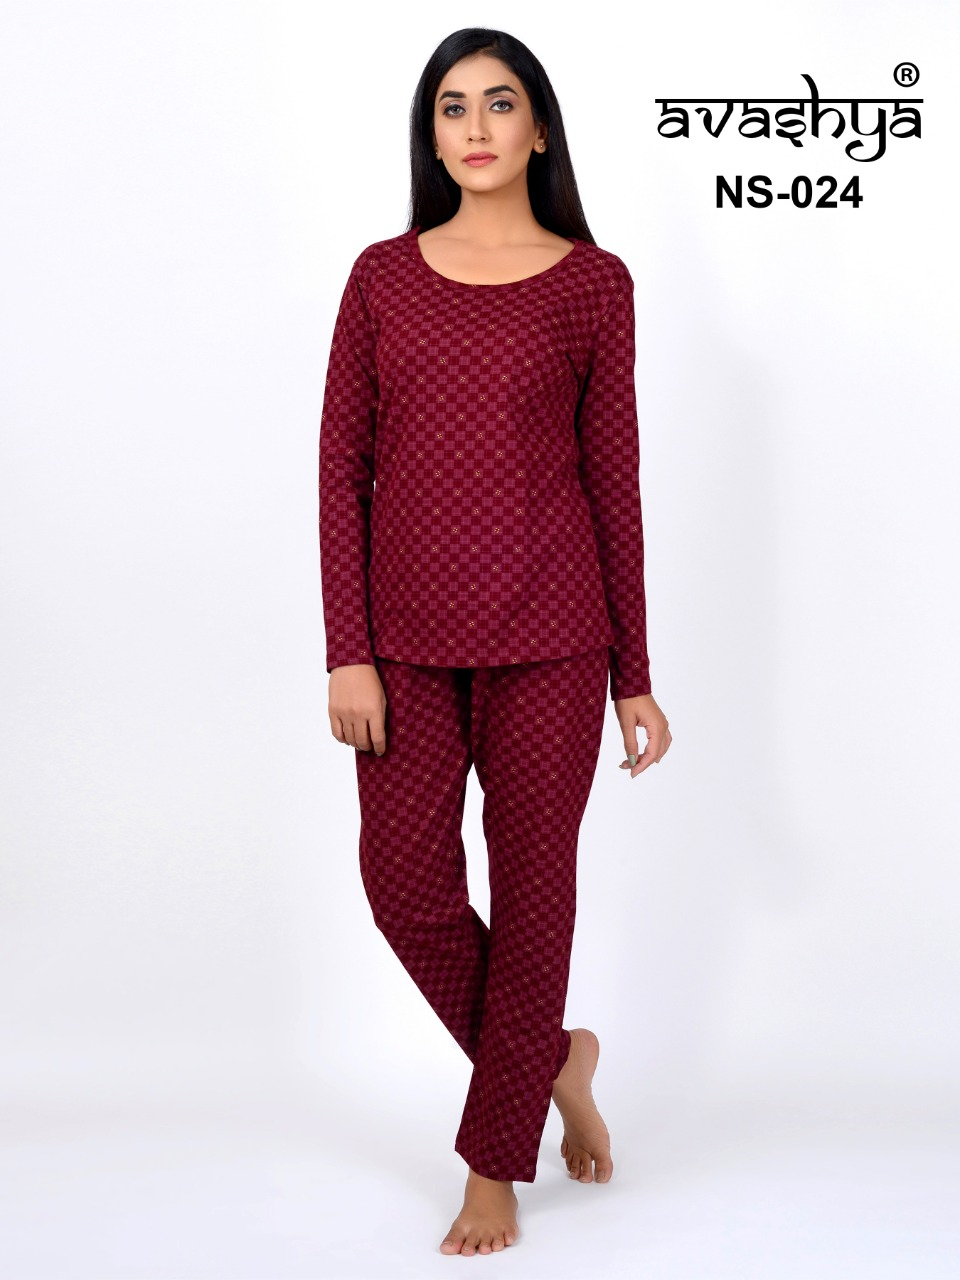 Avashya Premium Night Wear Vol 3 Wholesale Catalog 6 Pcs 5 - Avashya Premium Night Wear Vol 3 Wholesale Catalog 6 Pcs